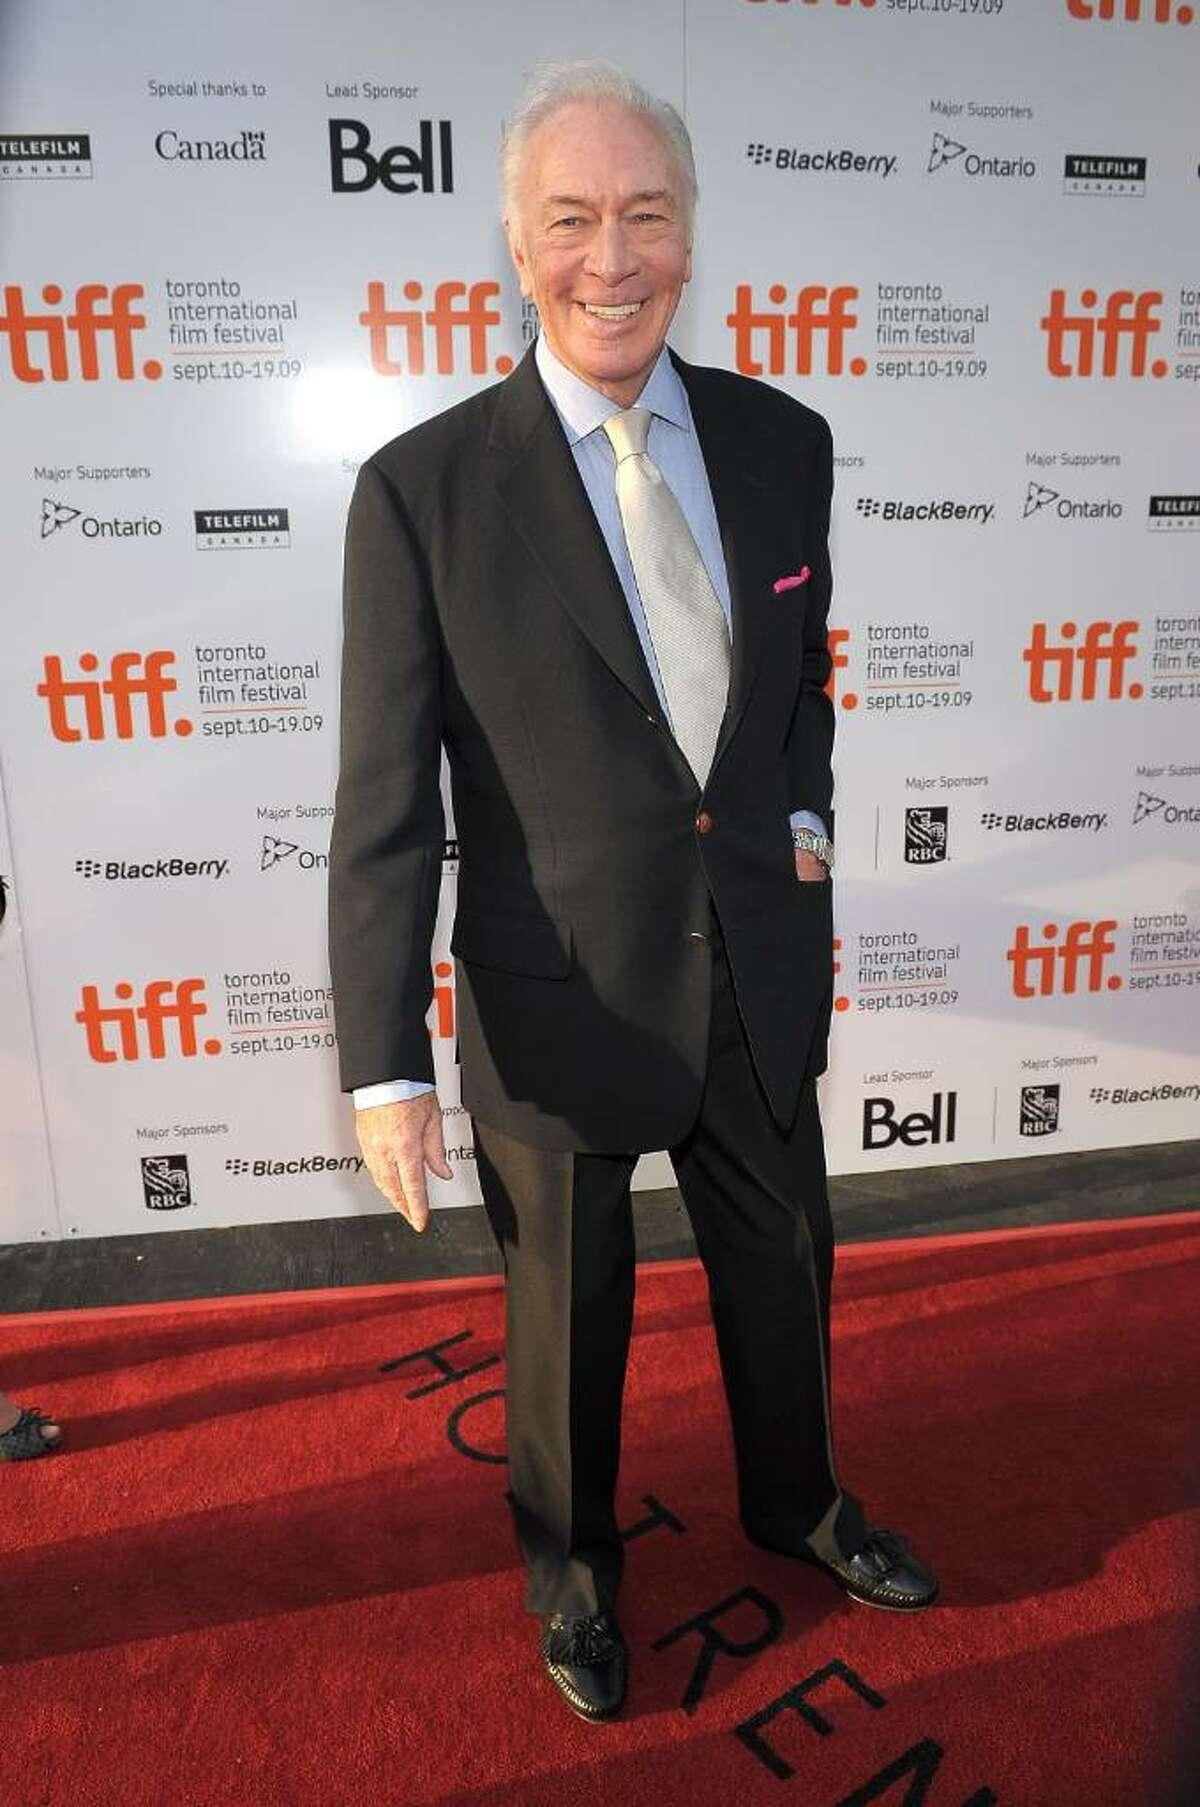 TORONTO, ON - SEPTEMBER 18: Actor Christopher Plummer attends the